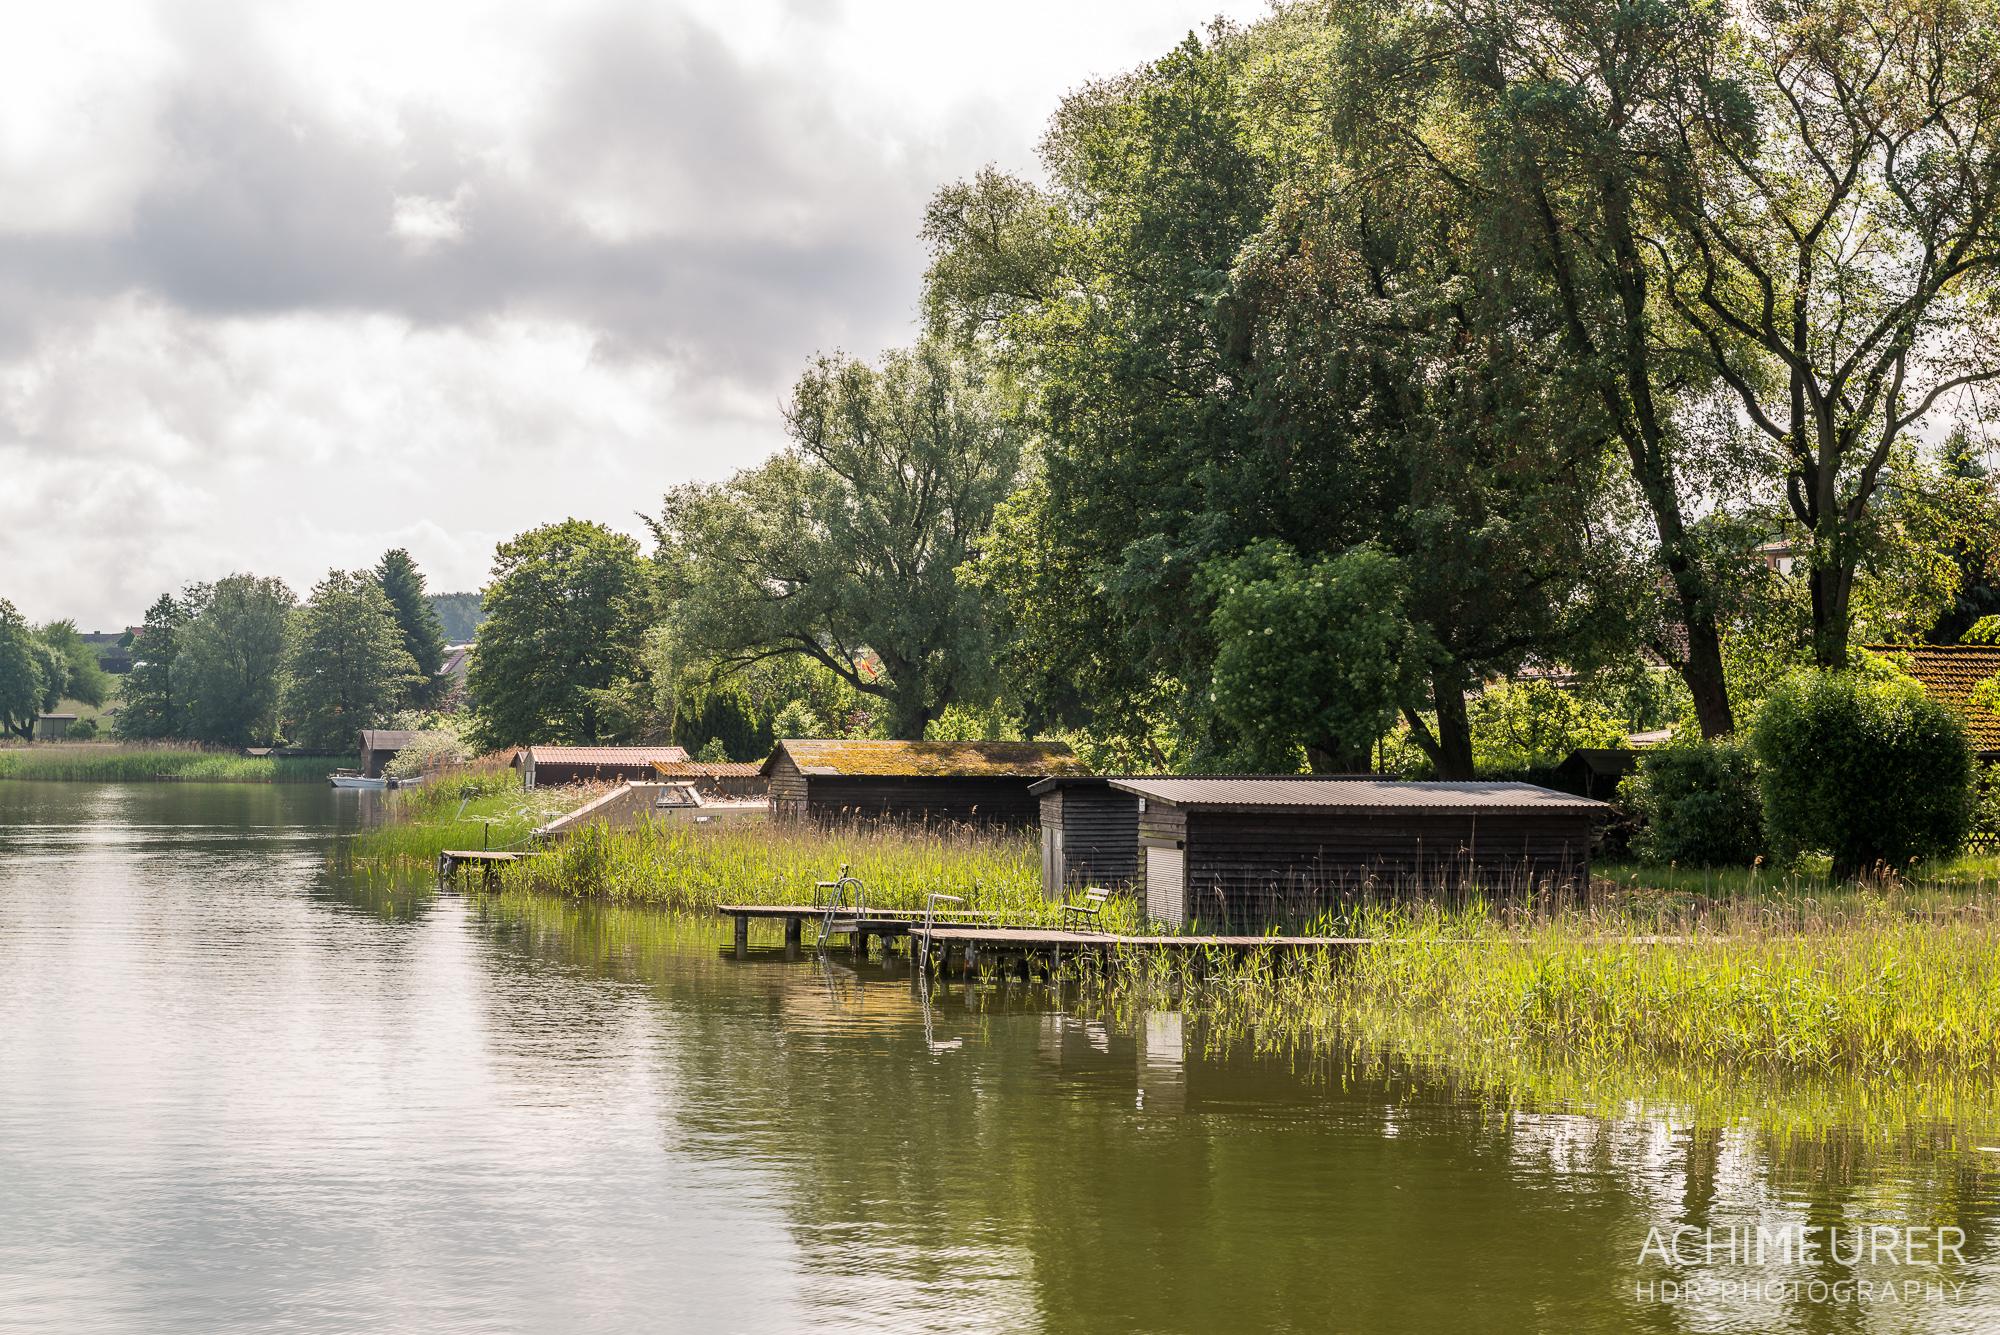 Hausboot-Kuhnle-Mueritz-Mecklenburg-Vorpommern-See_2810